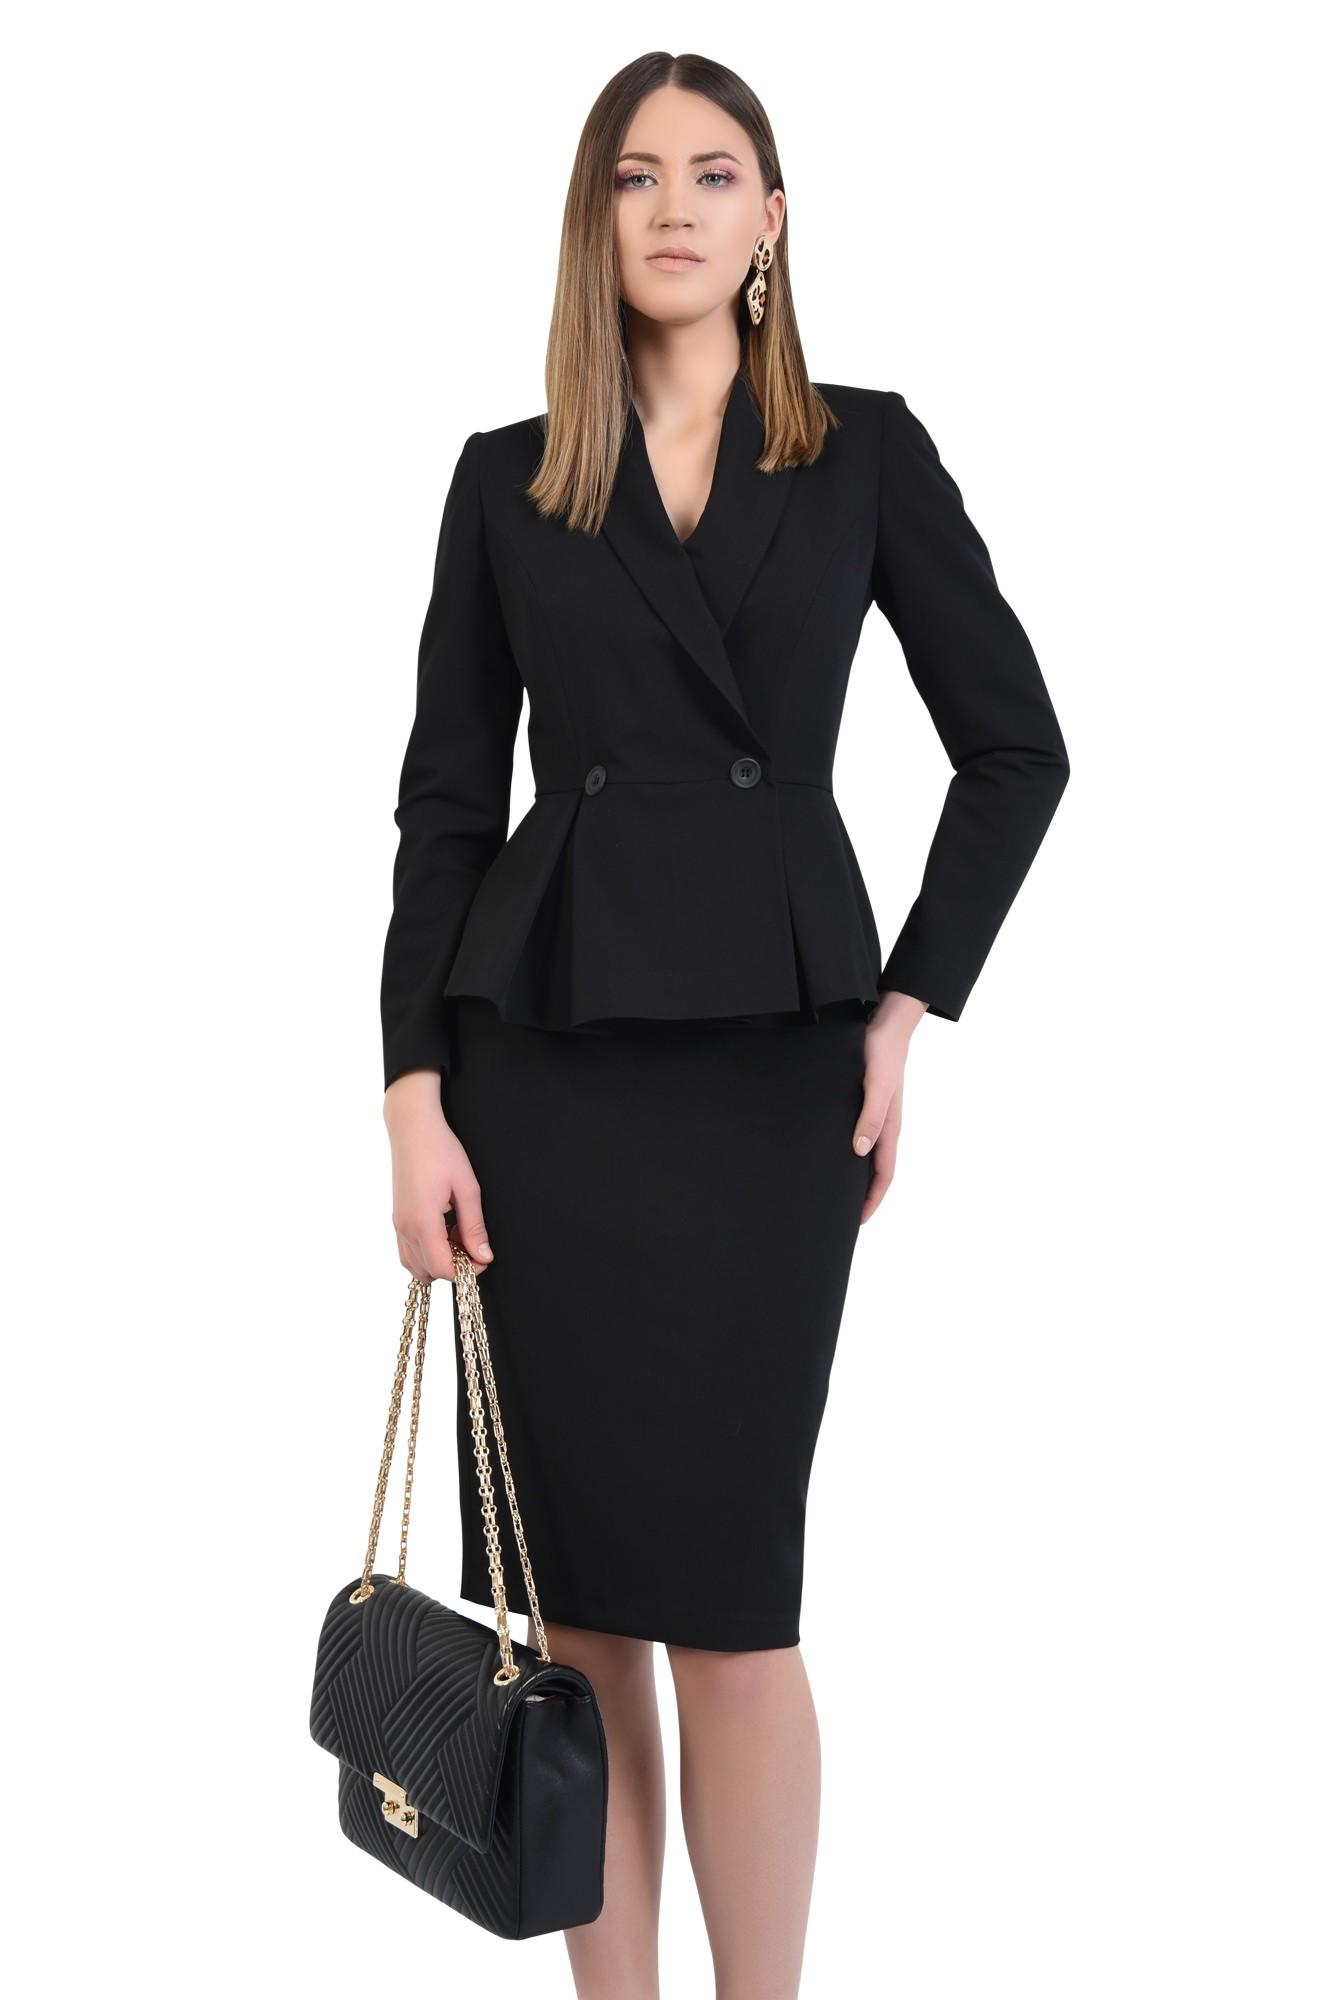 3 - 360 - blazer elegant, cu volan si pliuri, cu nasturi, revere rotunjite